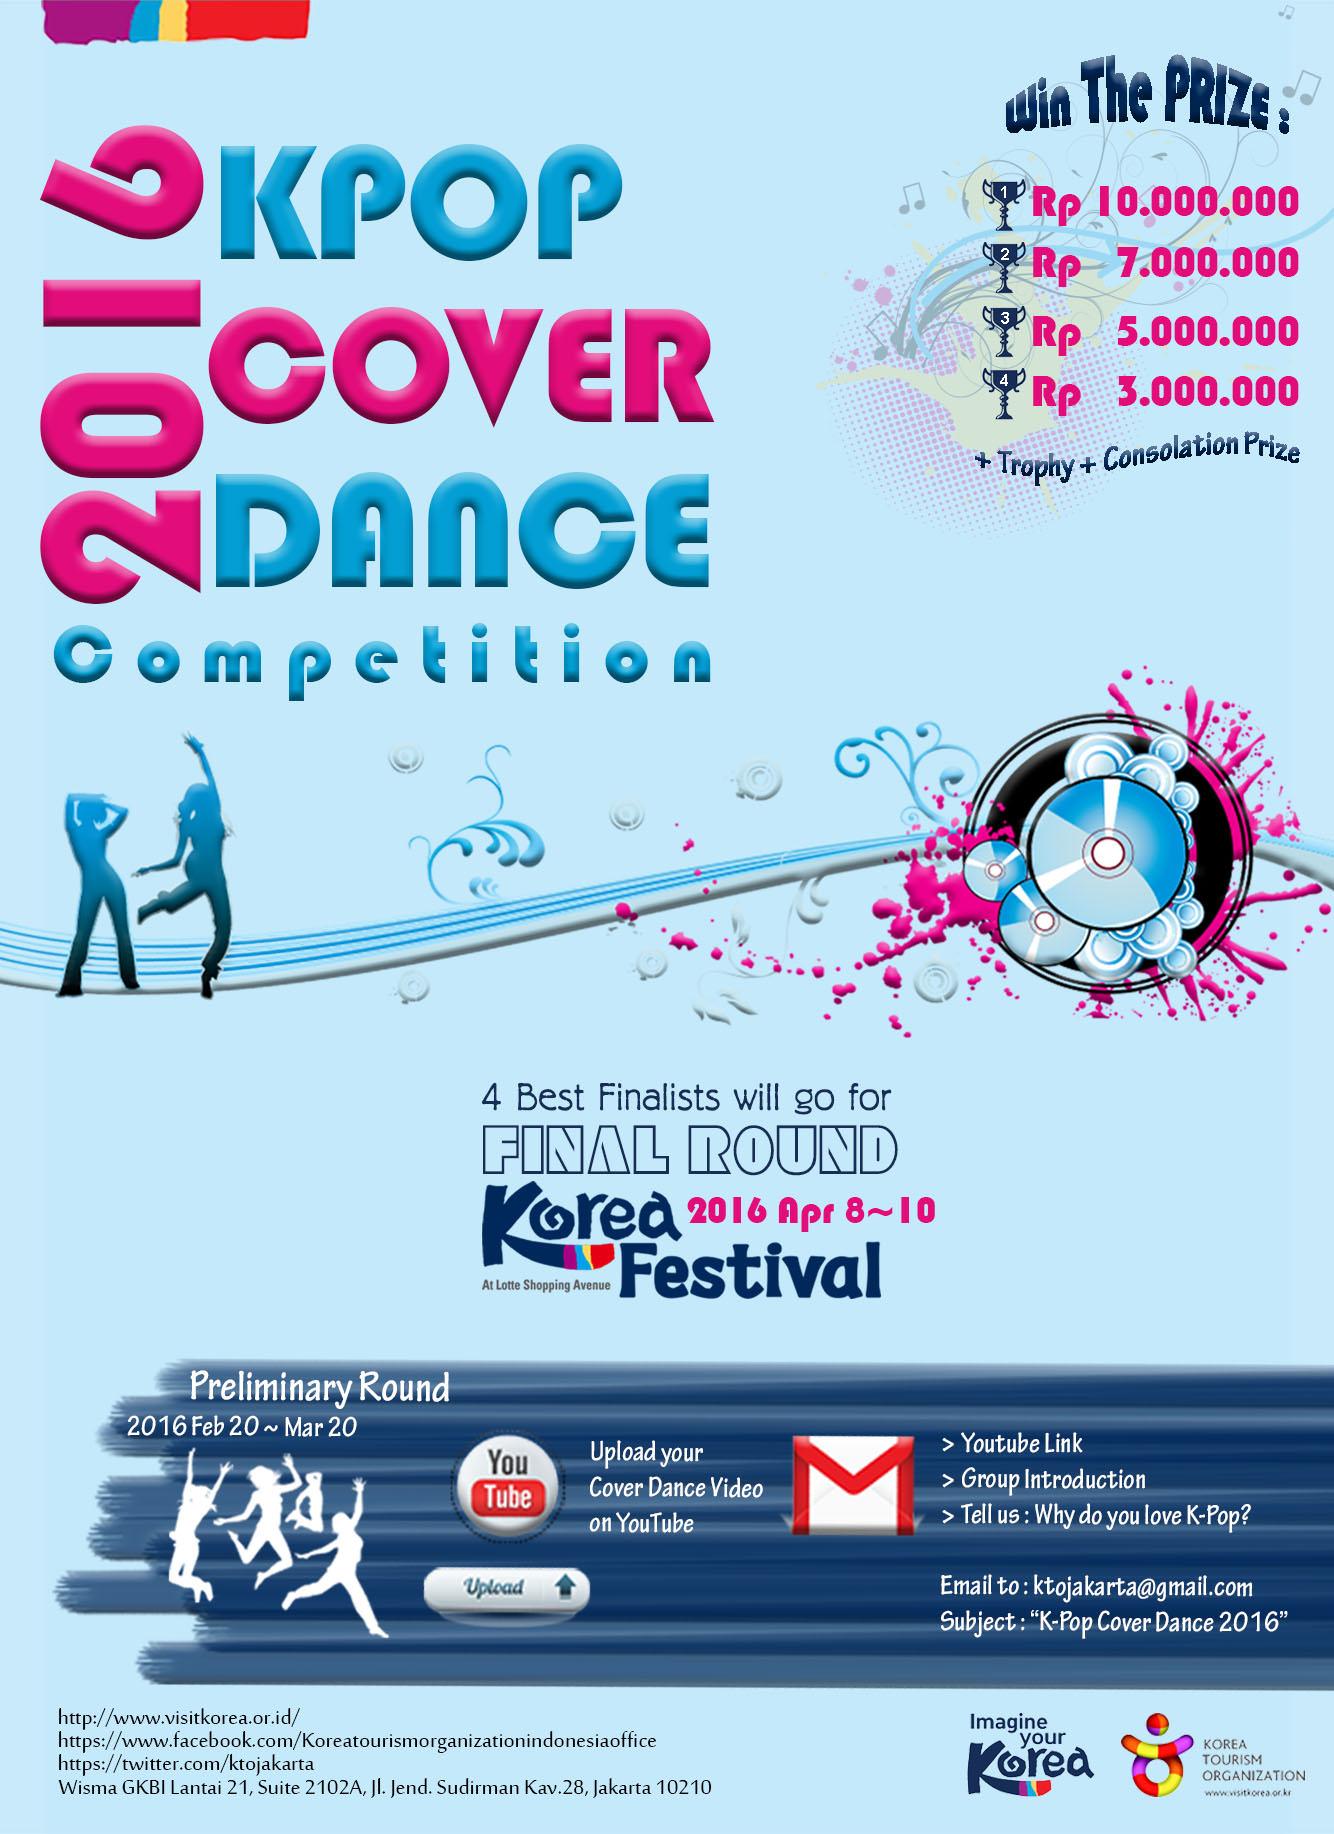 KOMPETESI K-POP COVER DANCE 2016